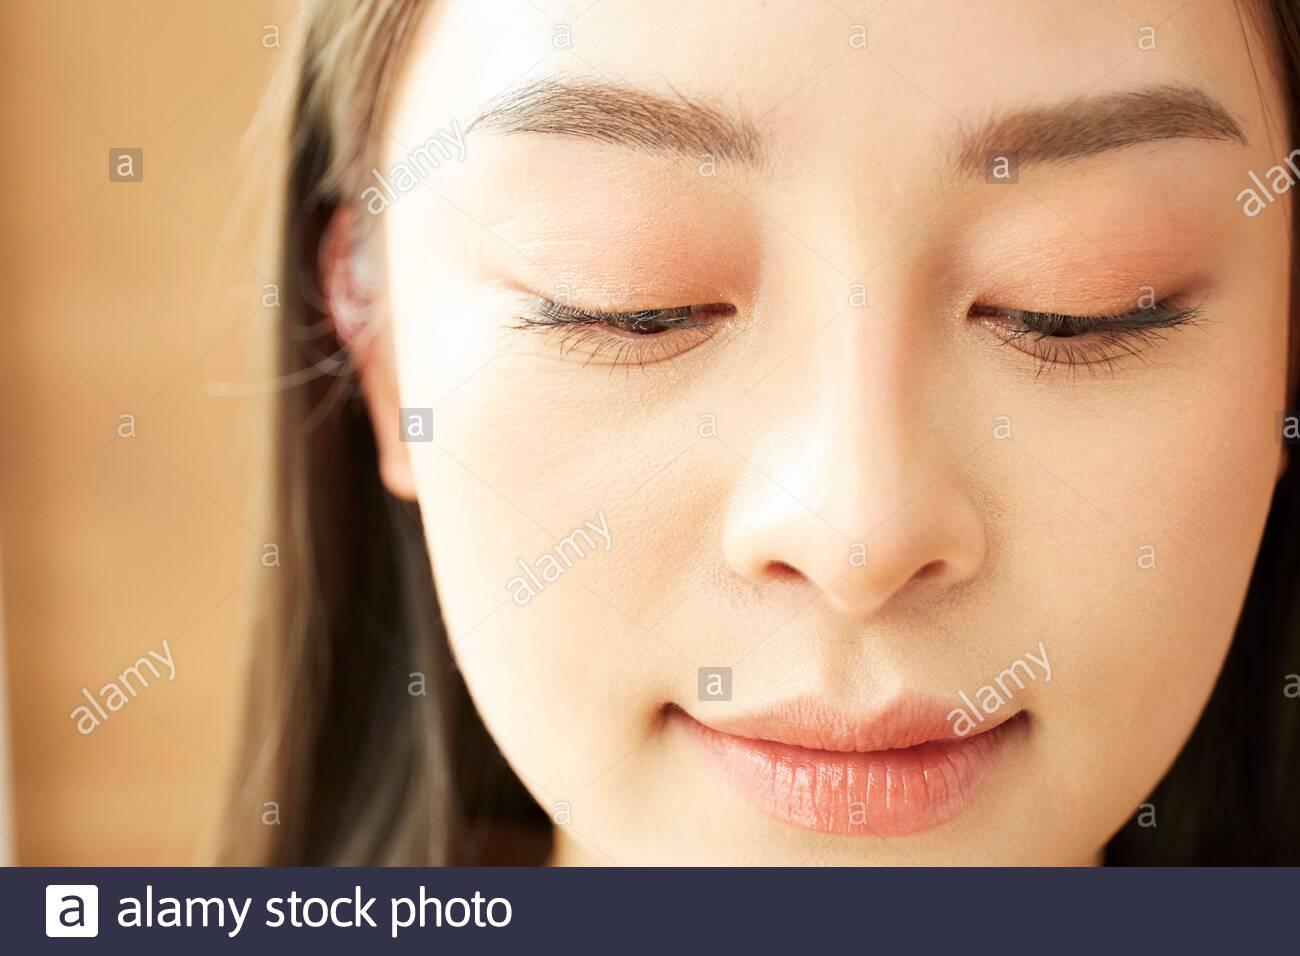 Face-up women Stock Photo